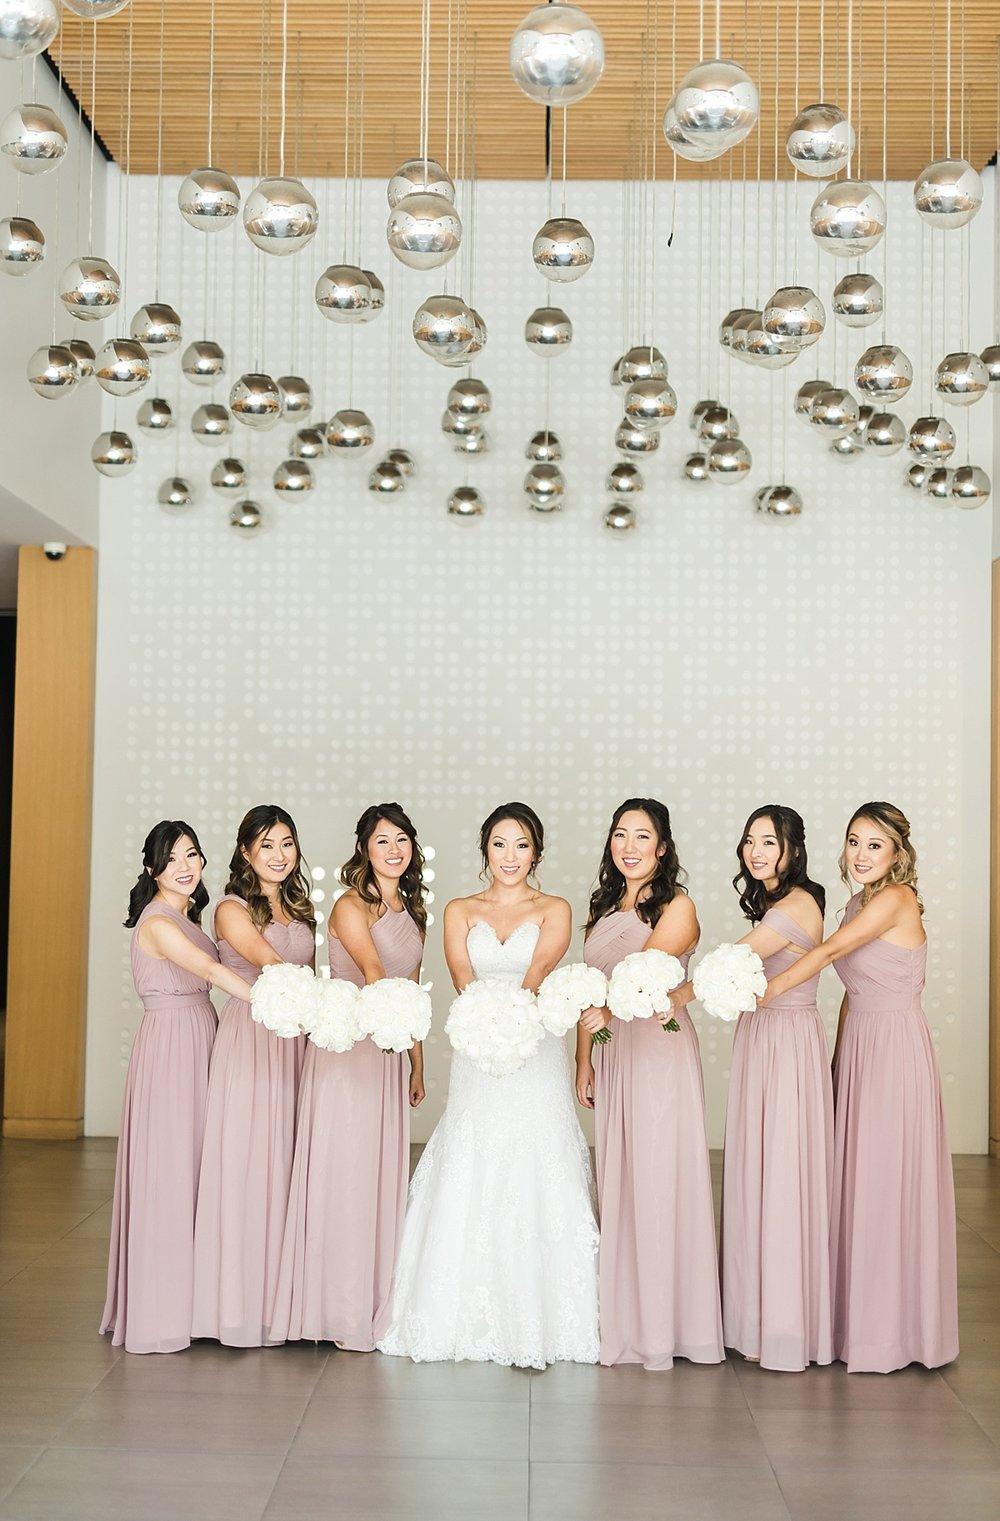 Alexandria-Ballrooms-Los-Angeles-Wedding-Photographer-Sarah_Darin-Carissa-Woo-Photography_0054.jpg